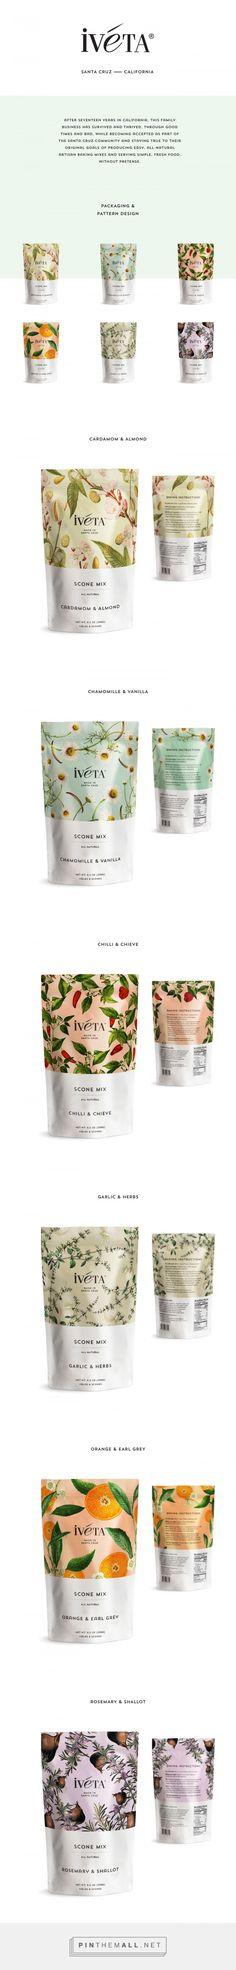 IVETA Scone Mix Packaging by Alvarez Juana | Fivestar Branding Agency – Design and Branding Agency & Curated Inspiration Gallery #packaging #design #inspiration #ideas #innovation #branding